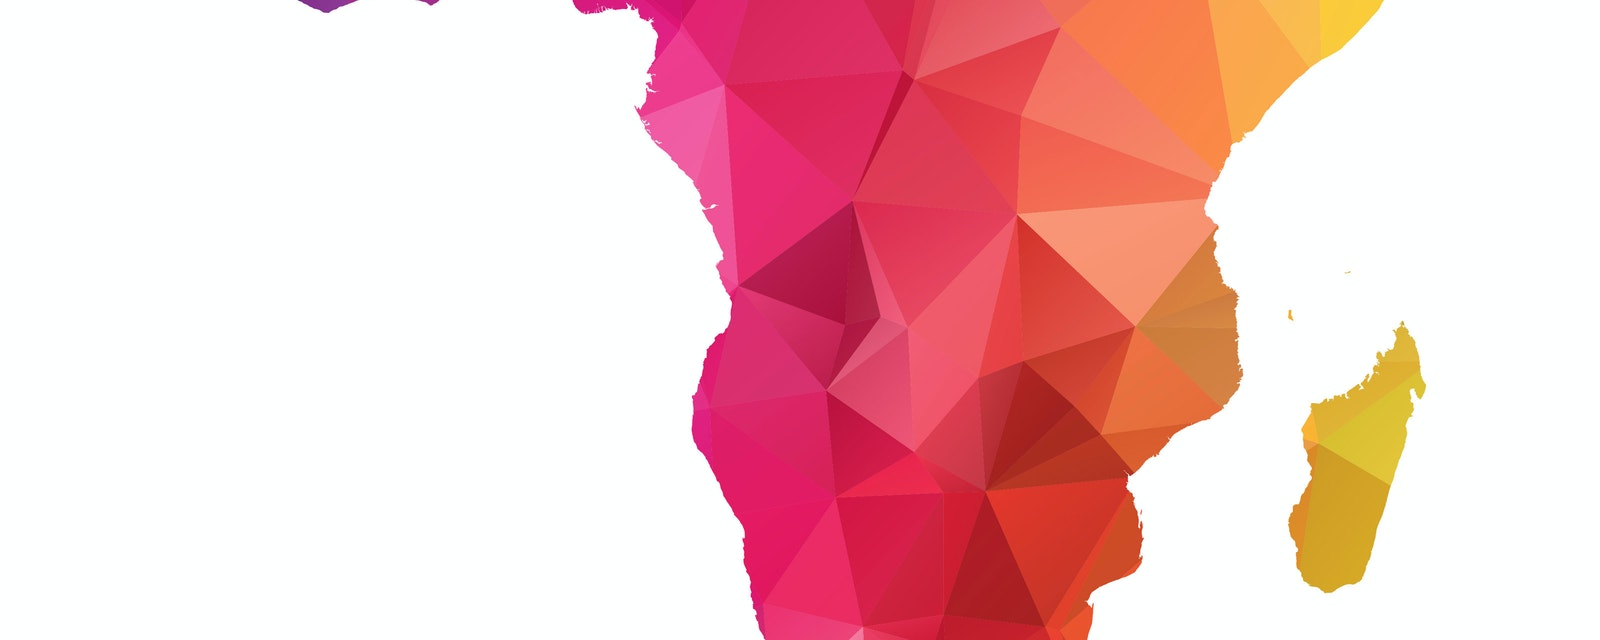 Abstract Polygon Map of Sub-Saharan Africa